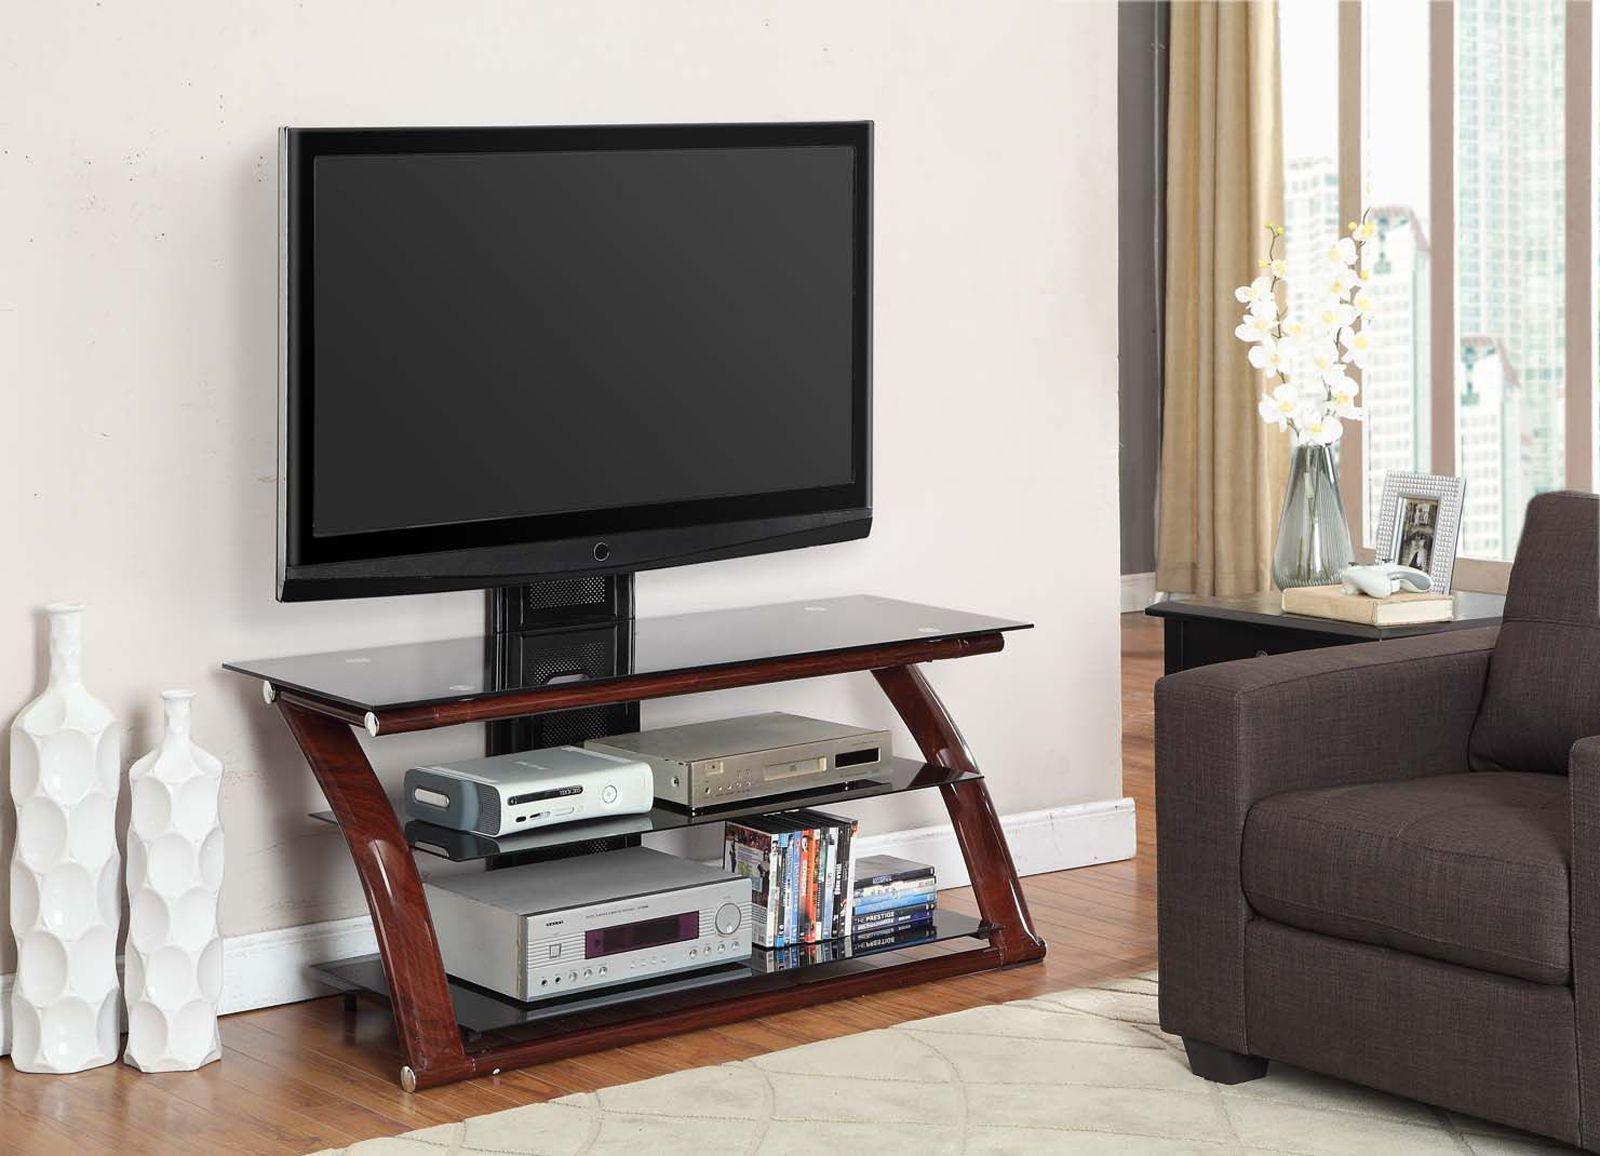 Rustic Corner Tv Unit In Solid Oak Oak Furnitureland Corner Tv Stand Oak Corner Tv Stand Corner Tv Cabinets